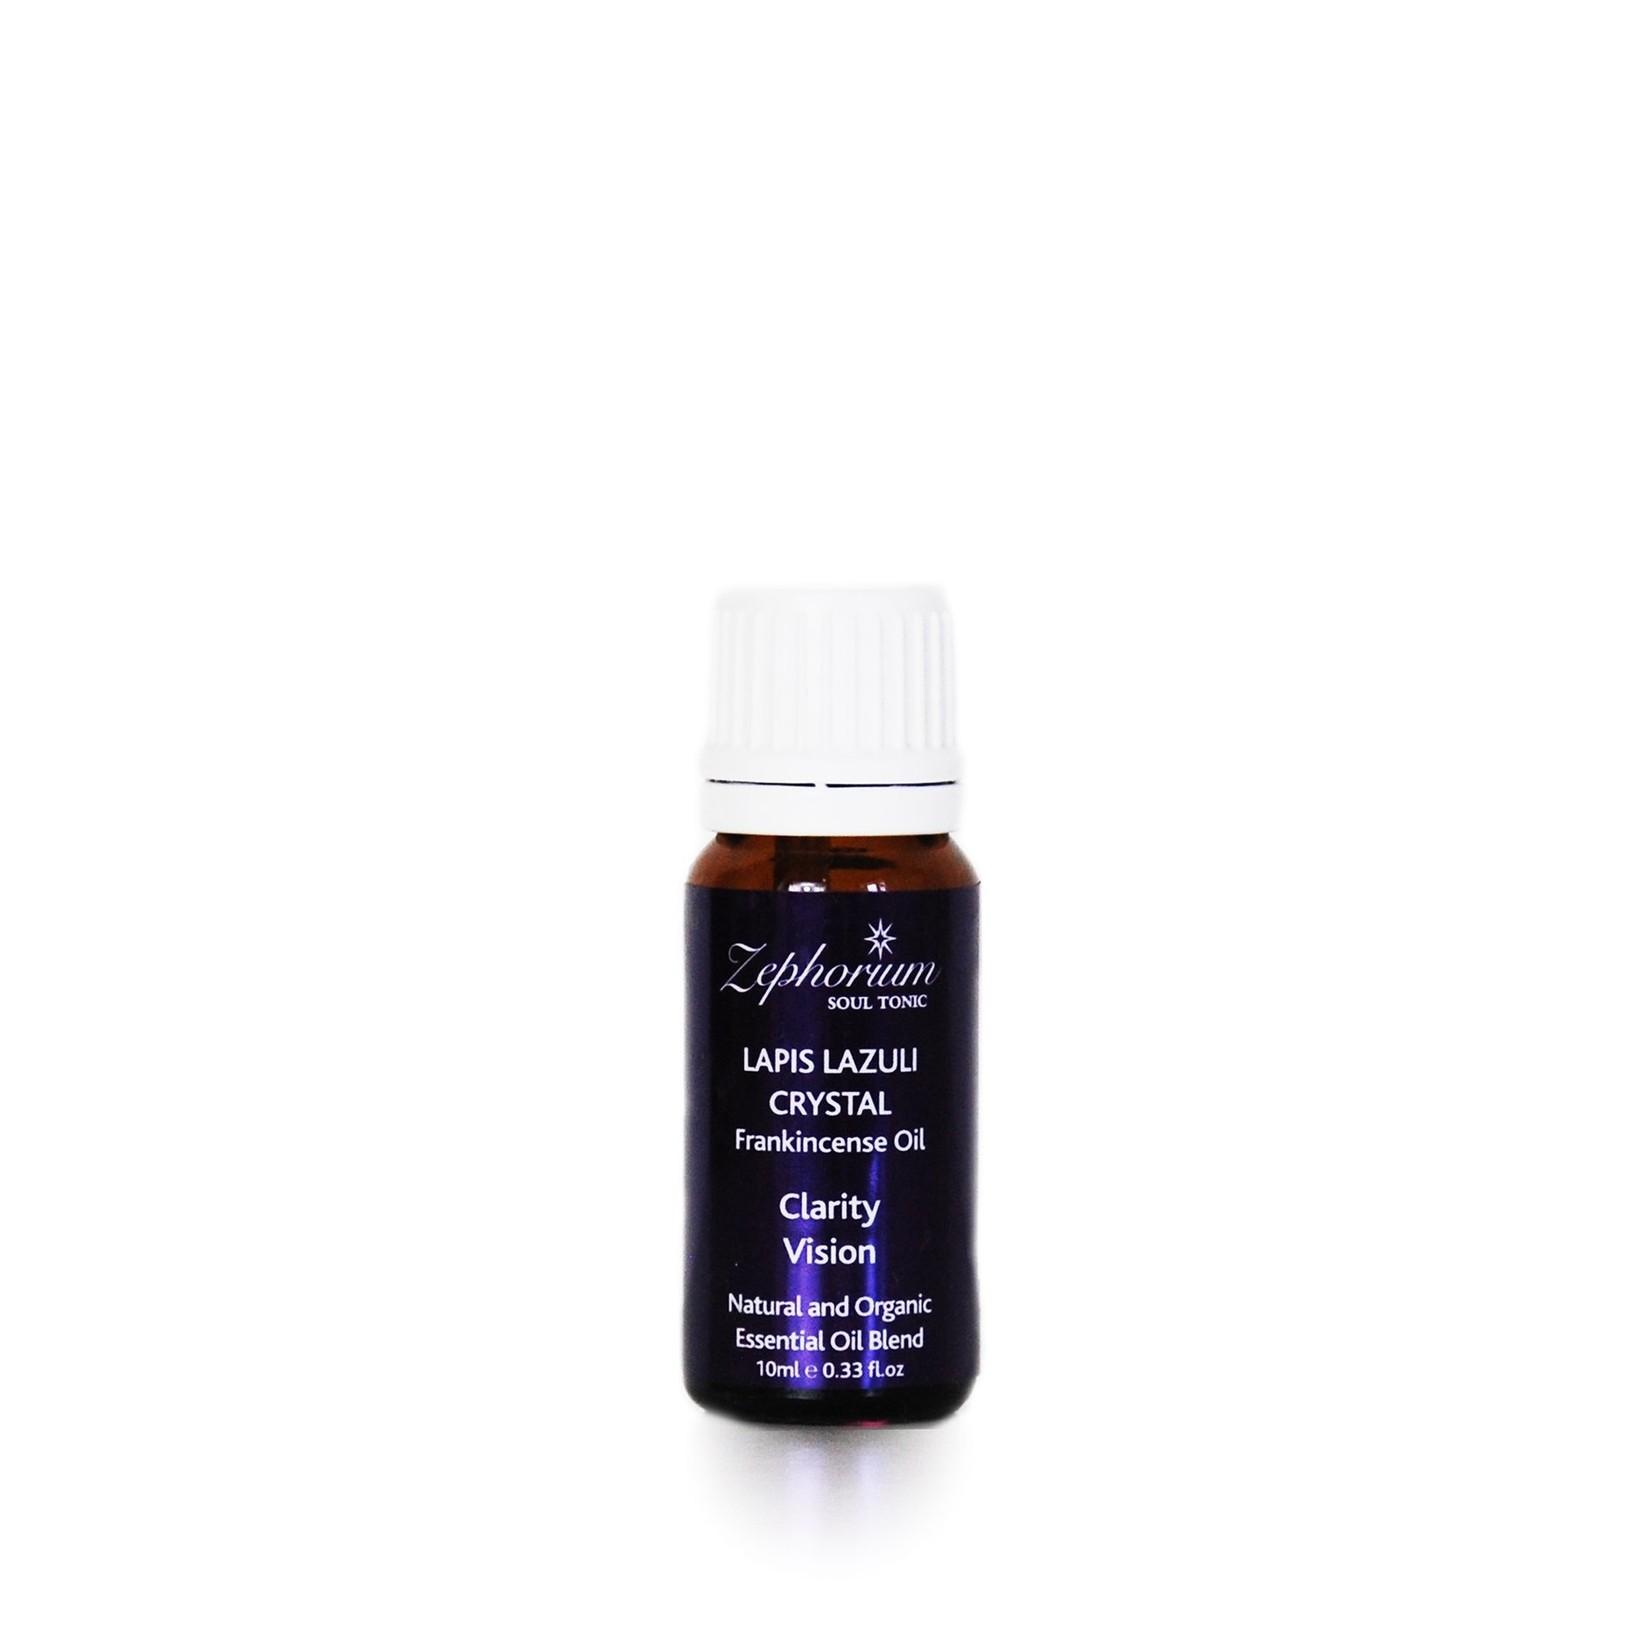 Zephorium Lapis Lazuli essential oil blend - derde oog chakra